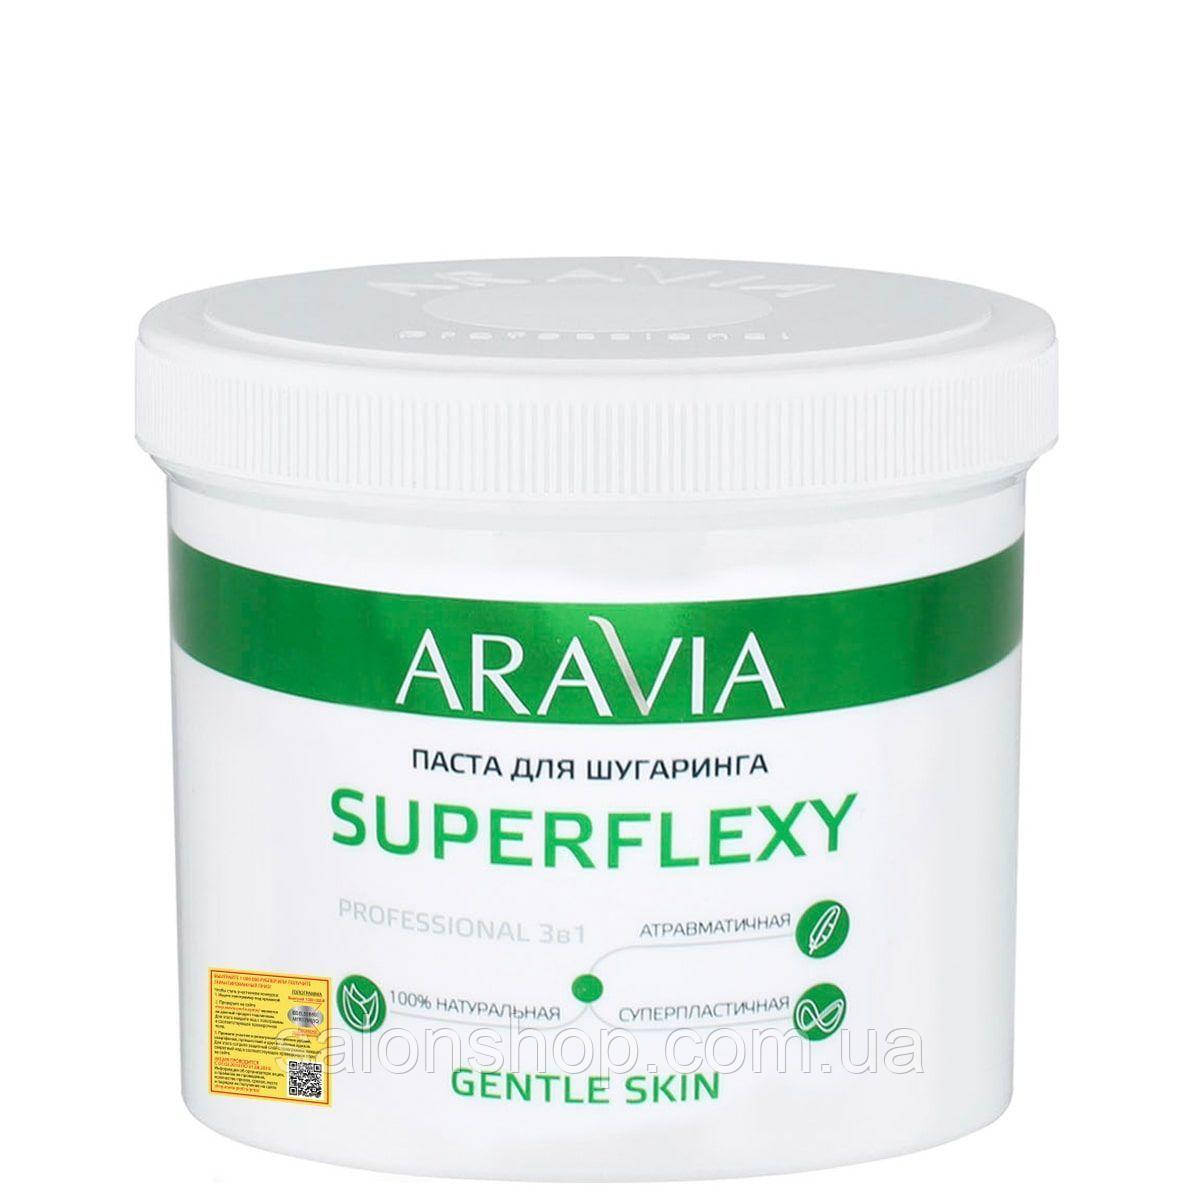 """ARAVIA Professional"" Паста для шугаринга SUPERFLEXY Gentle Skin, 750 г."